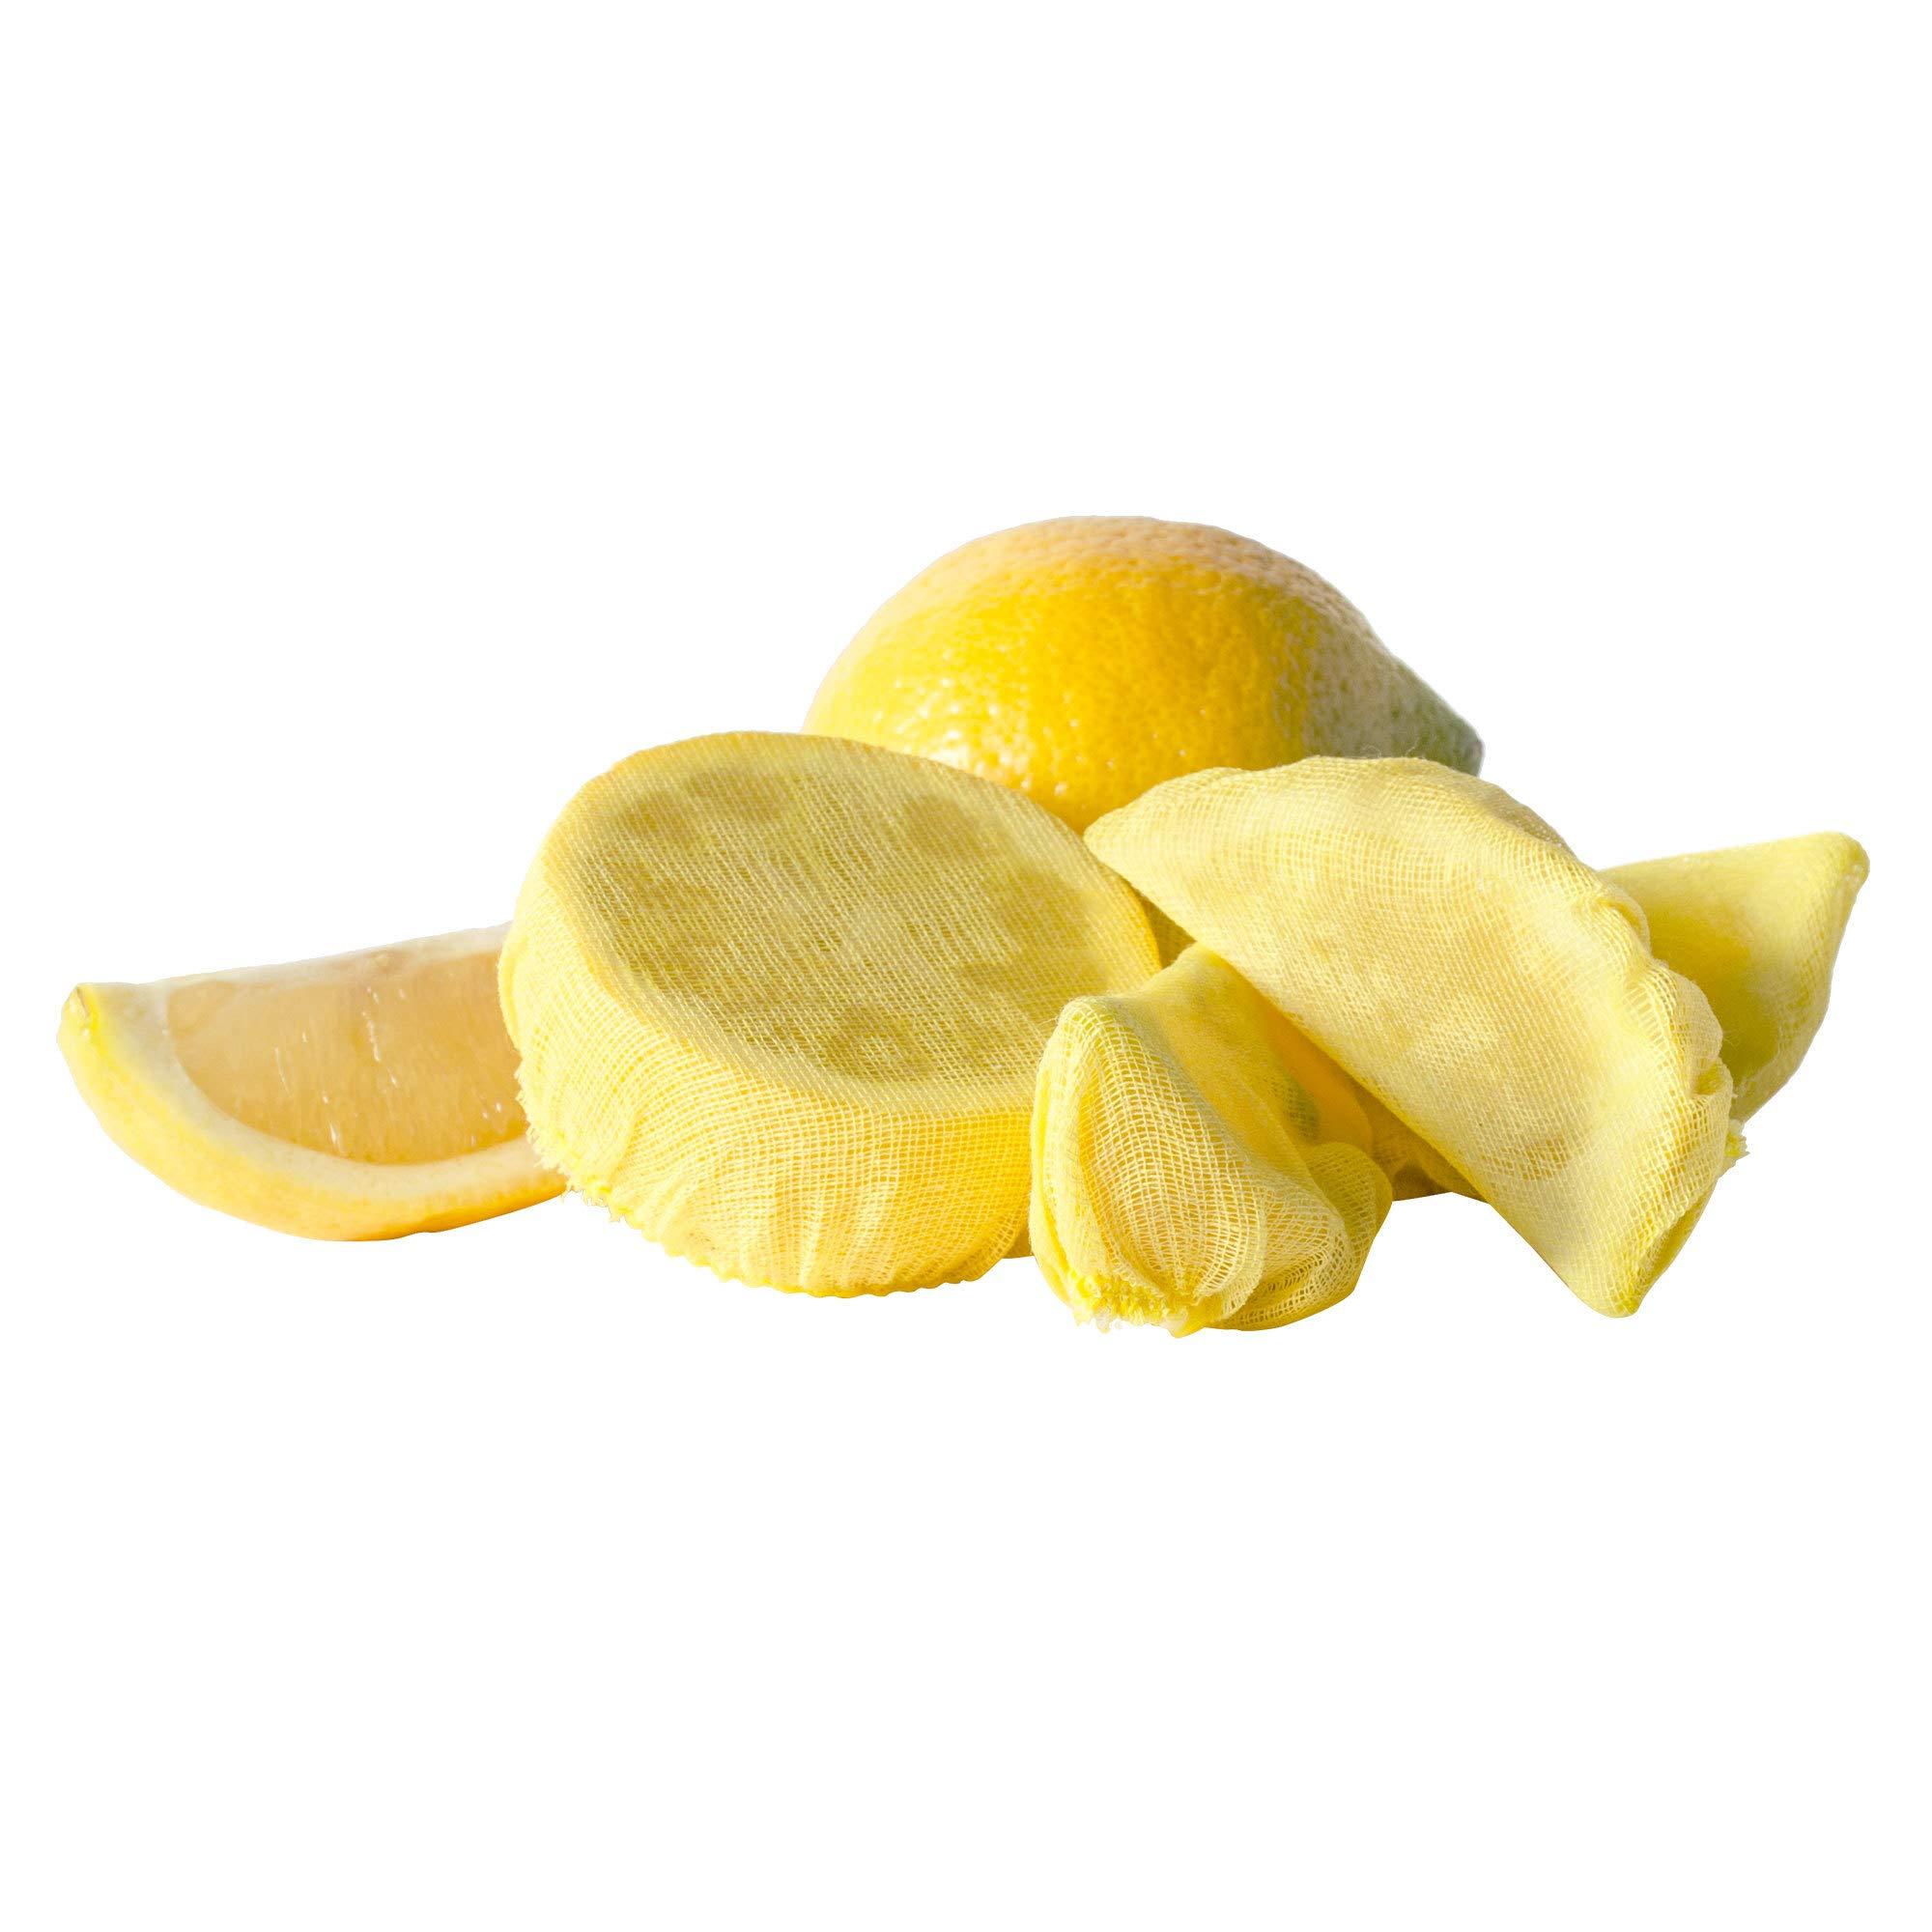 TableTop King Paper RLWB25 Yellow Lemon Wedge Bag - 100/Pack by TableTop King (Image #1)